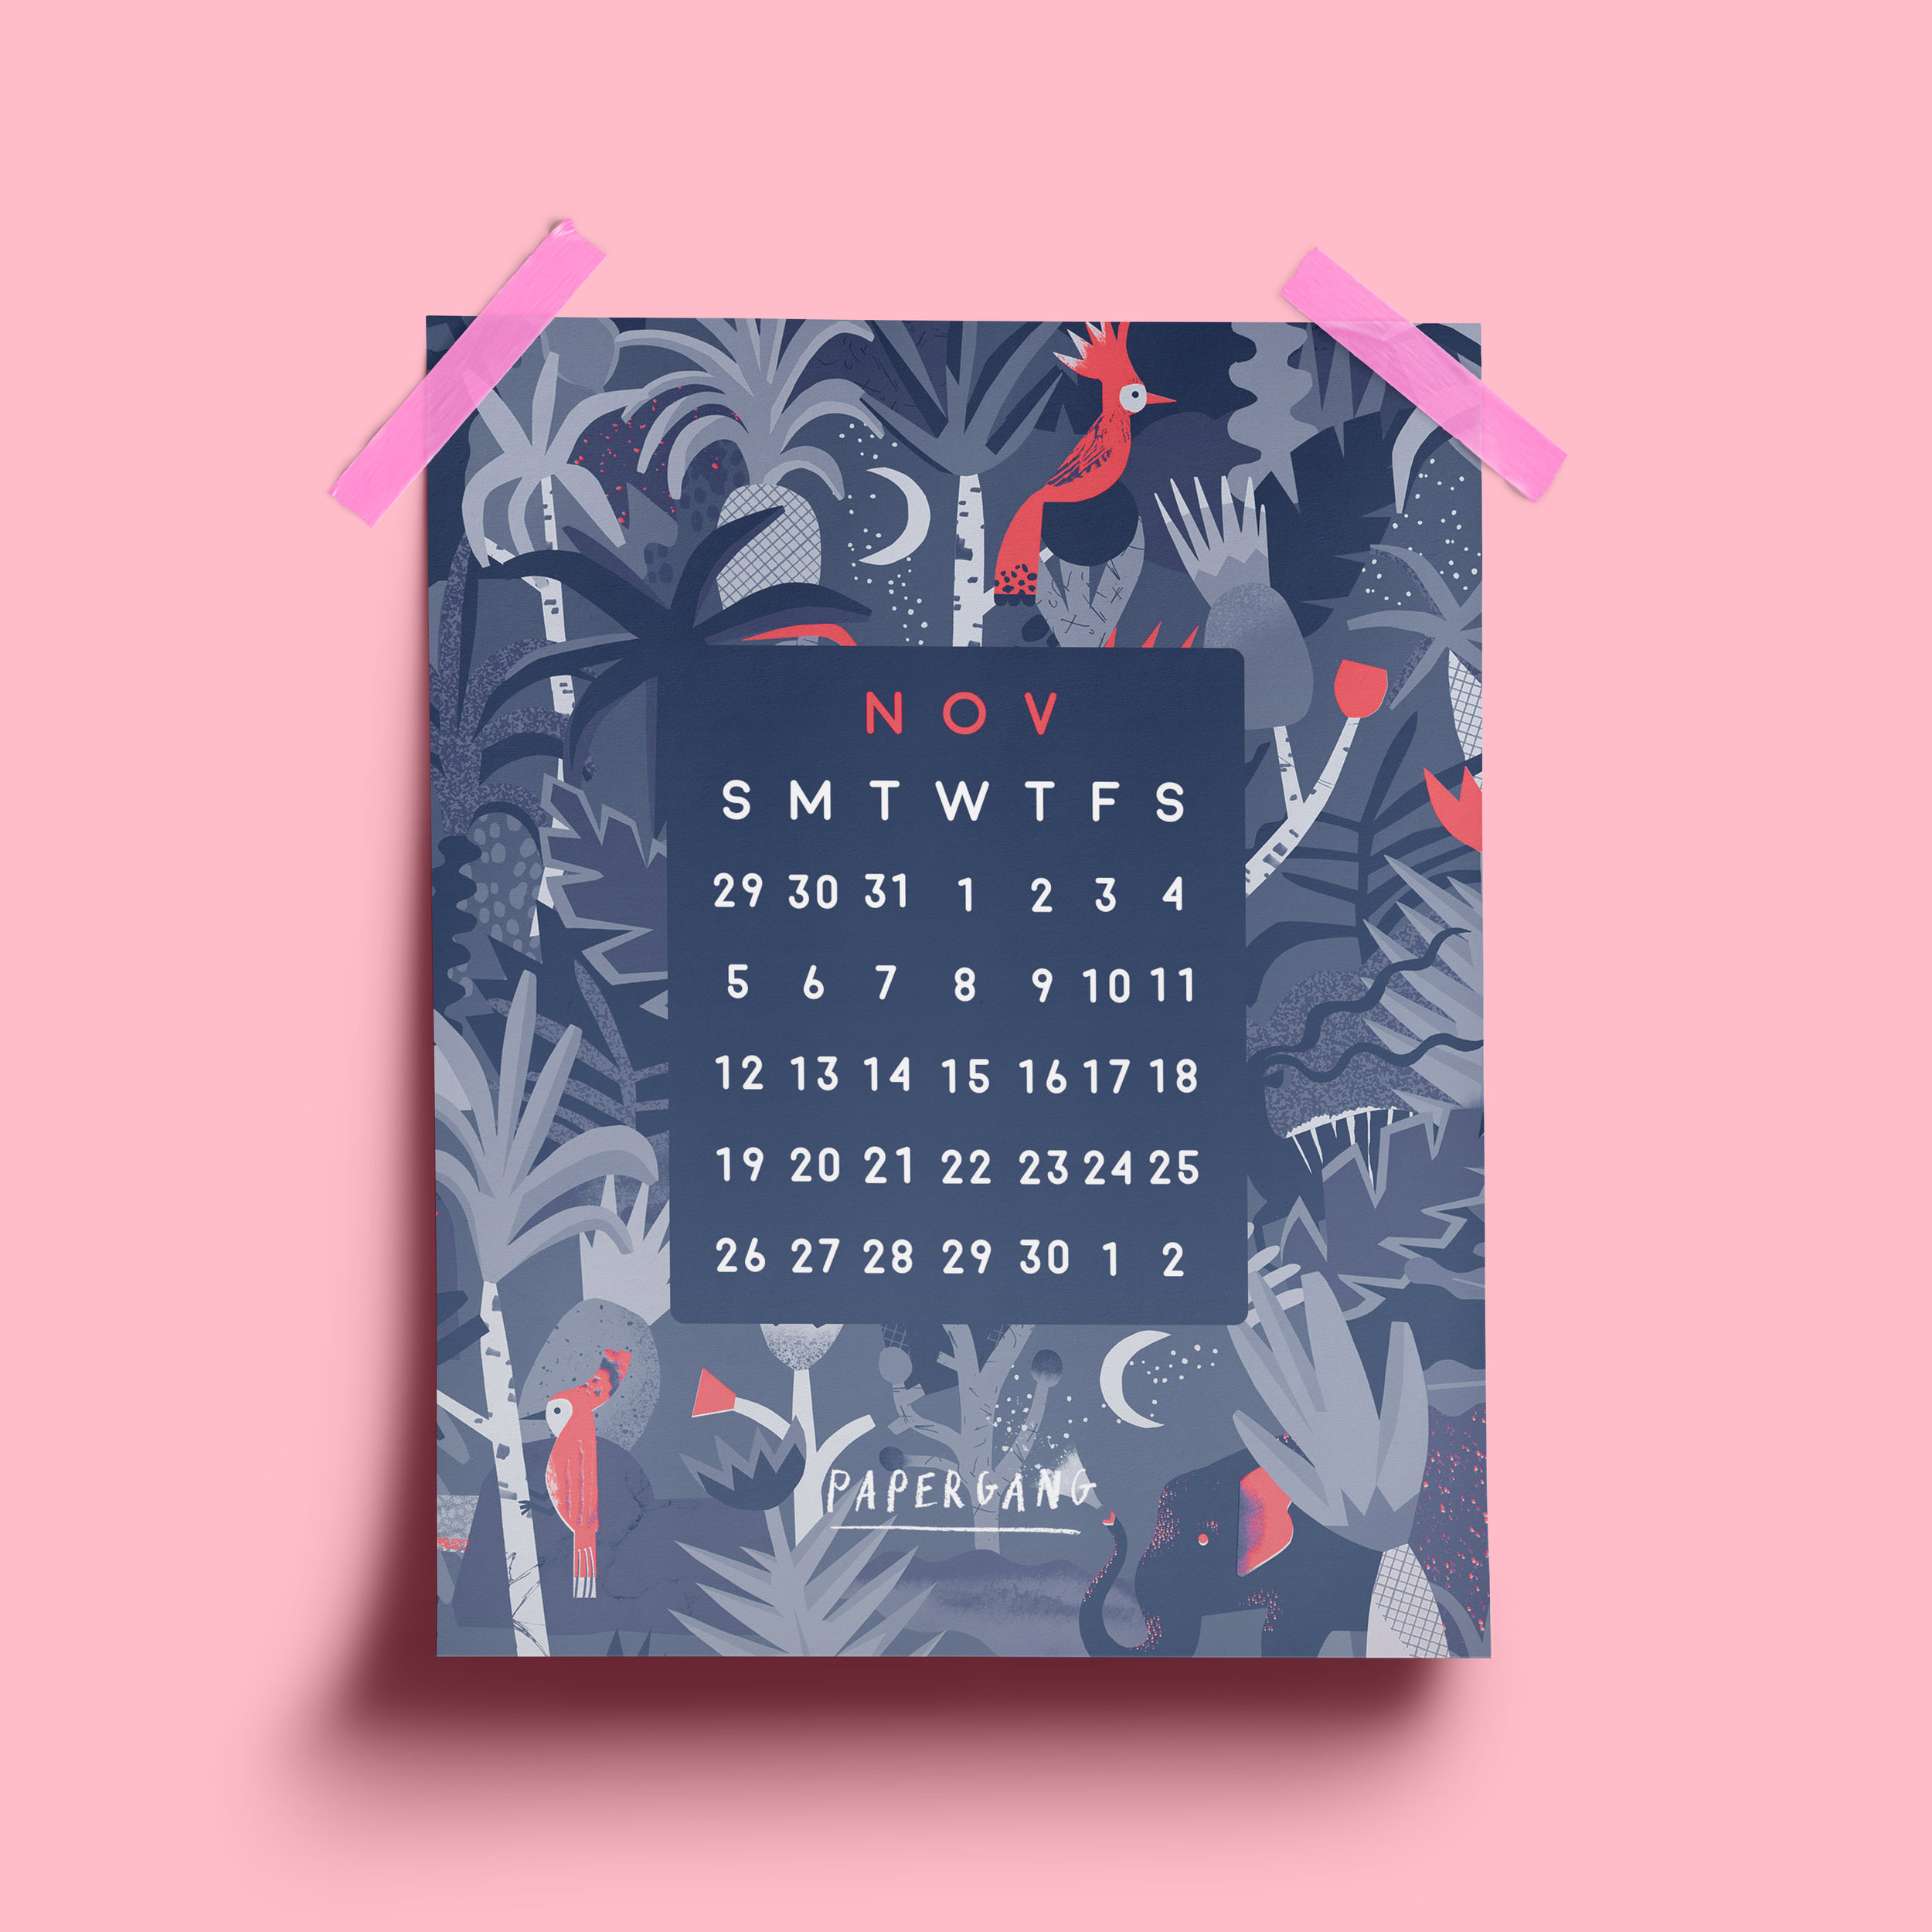 Papergang-Nov-2017-Calendar-Mock-Up.jpg